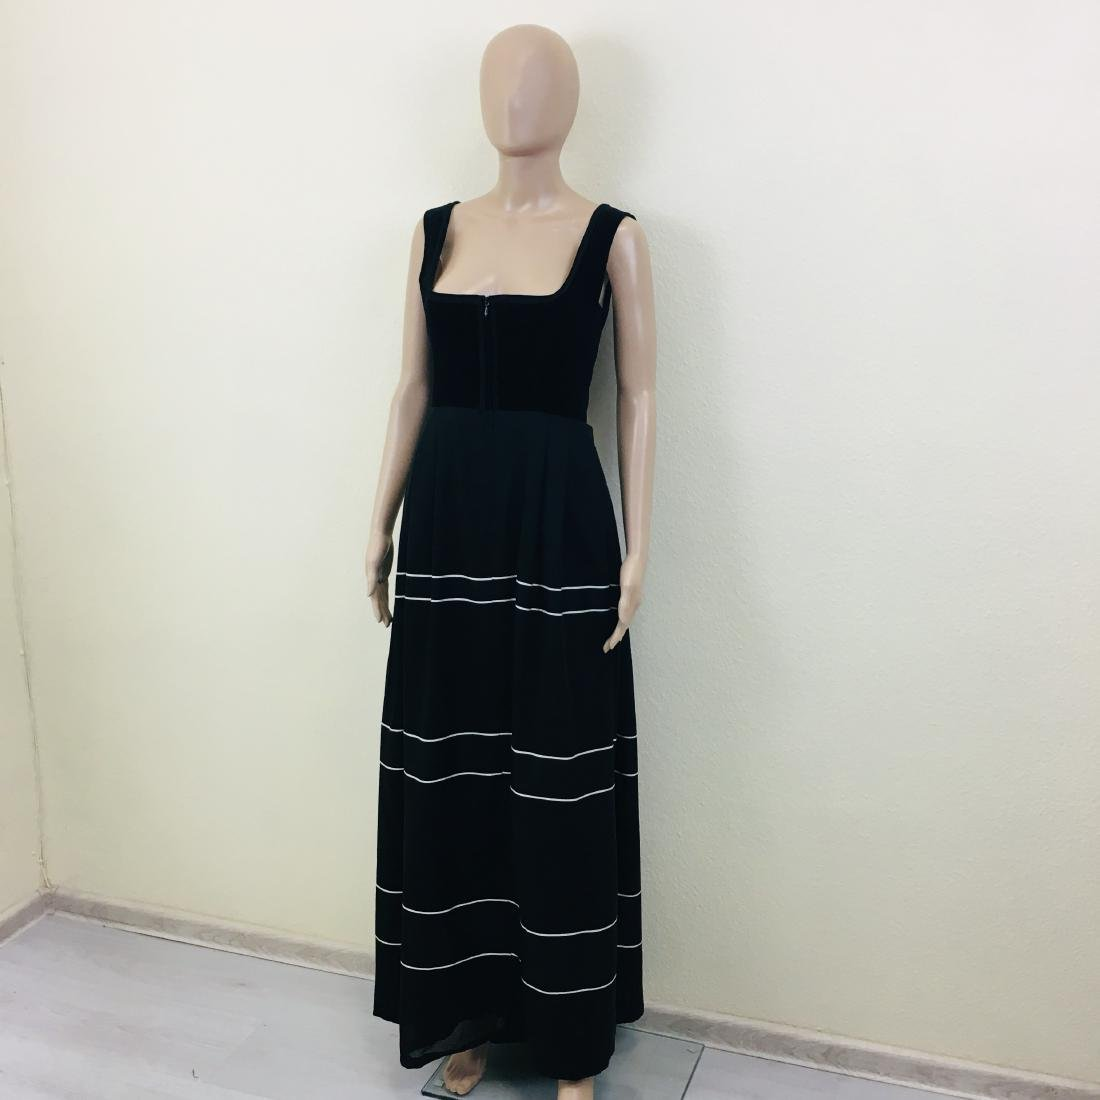 Vintage Women's Black Tyrolean Drindl Dress - 2